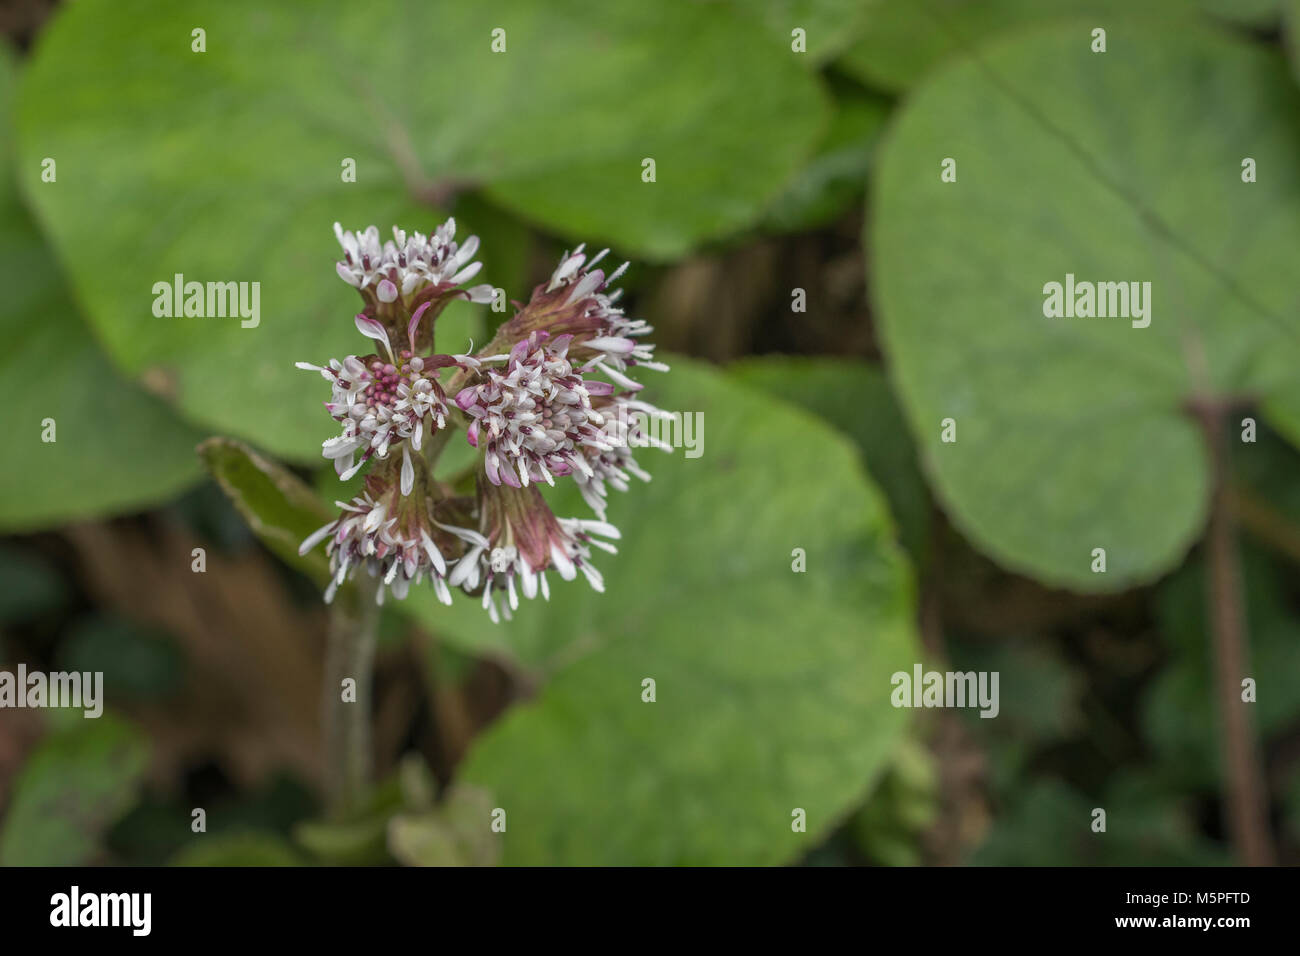 Flwoers and leaves of Butterbur. Plant formerly used in herbal medicine / folk remedies. - Stock Image